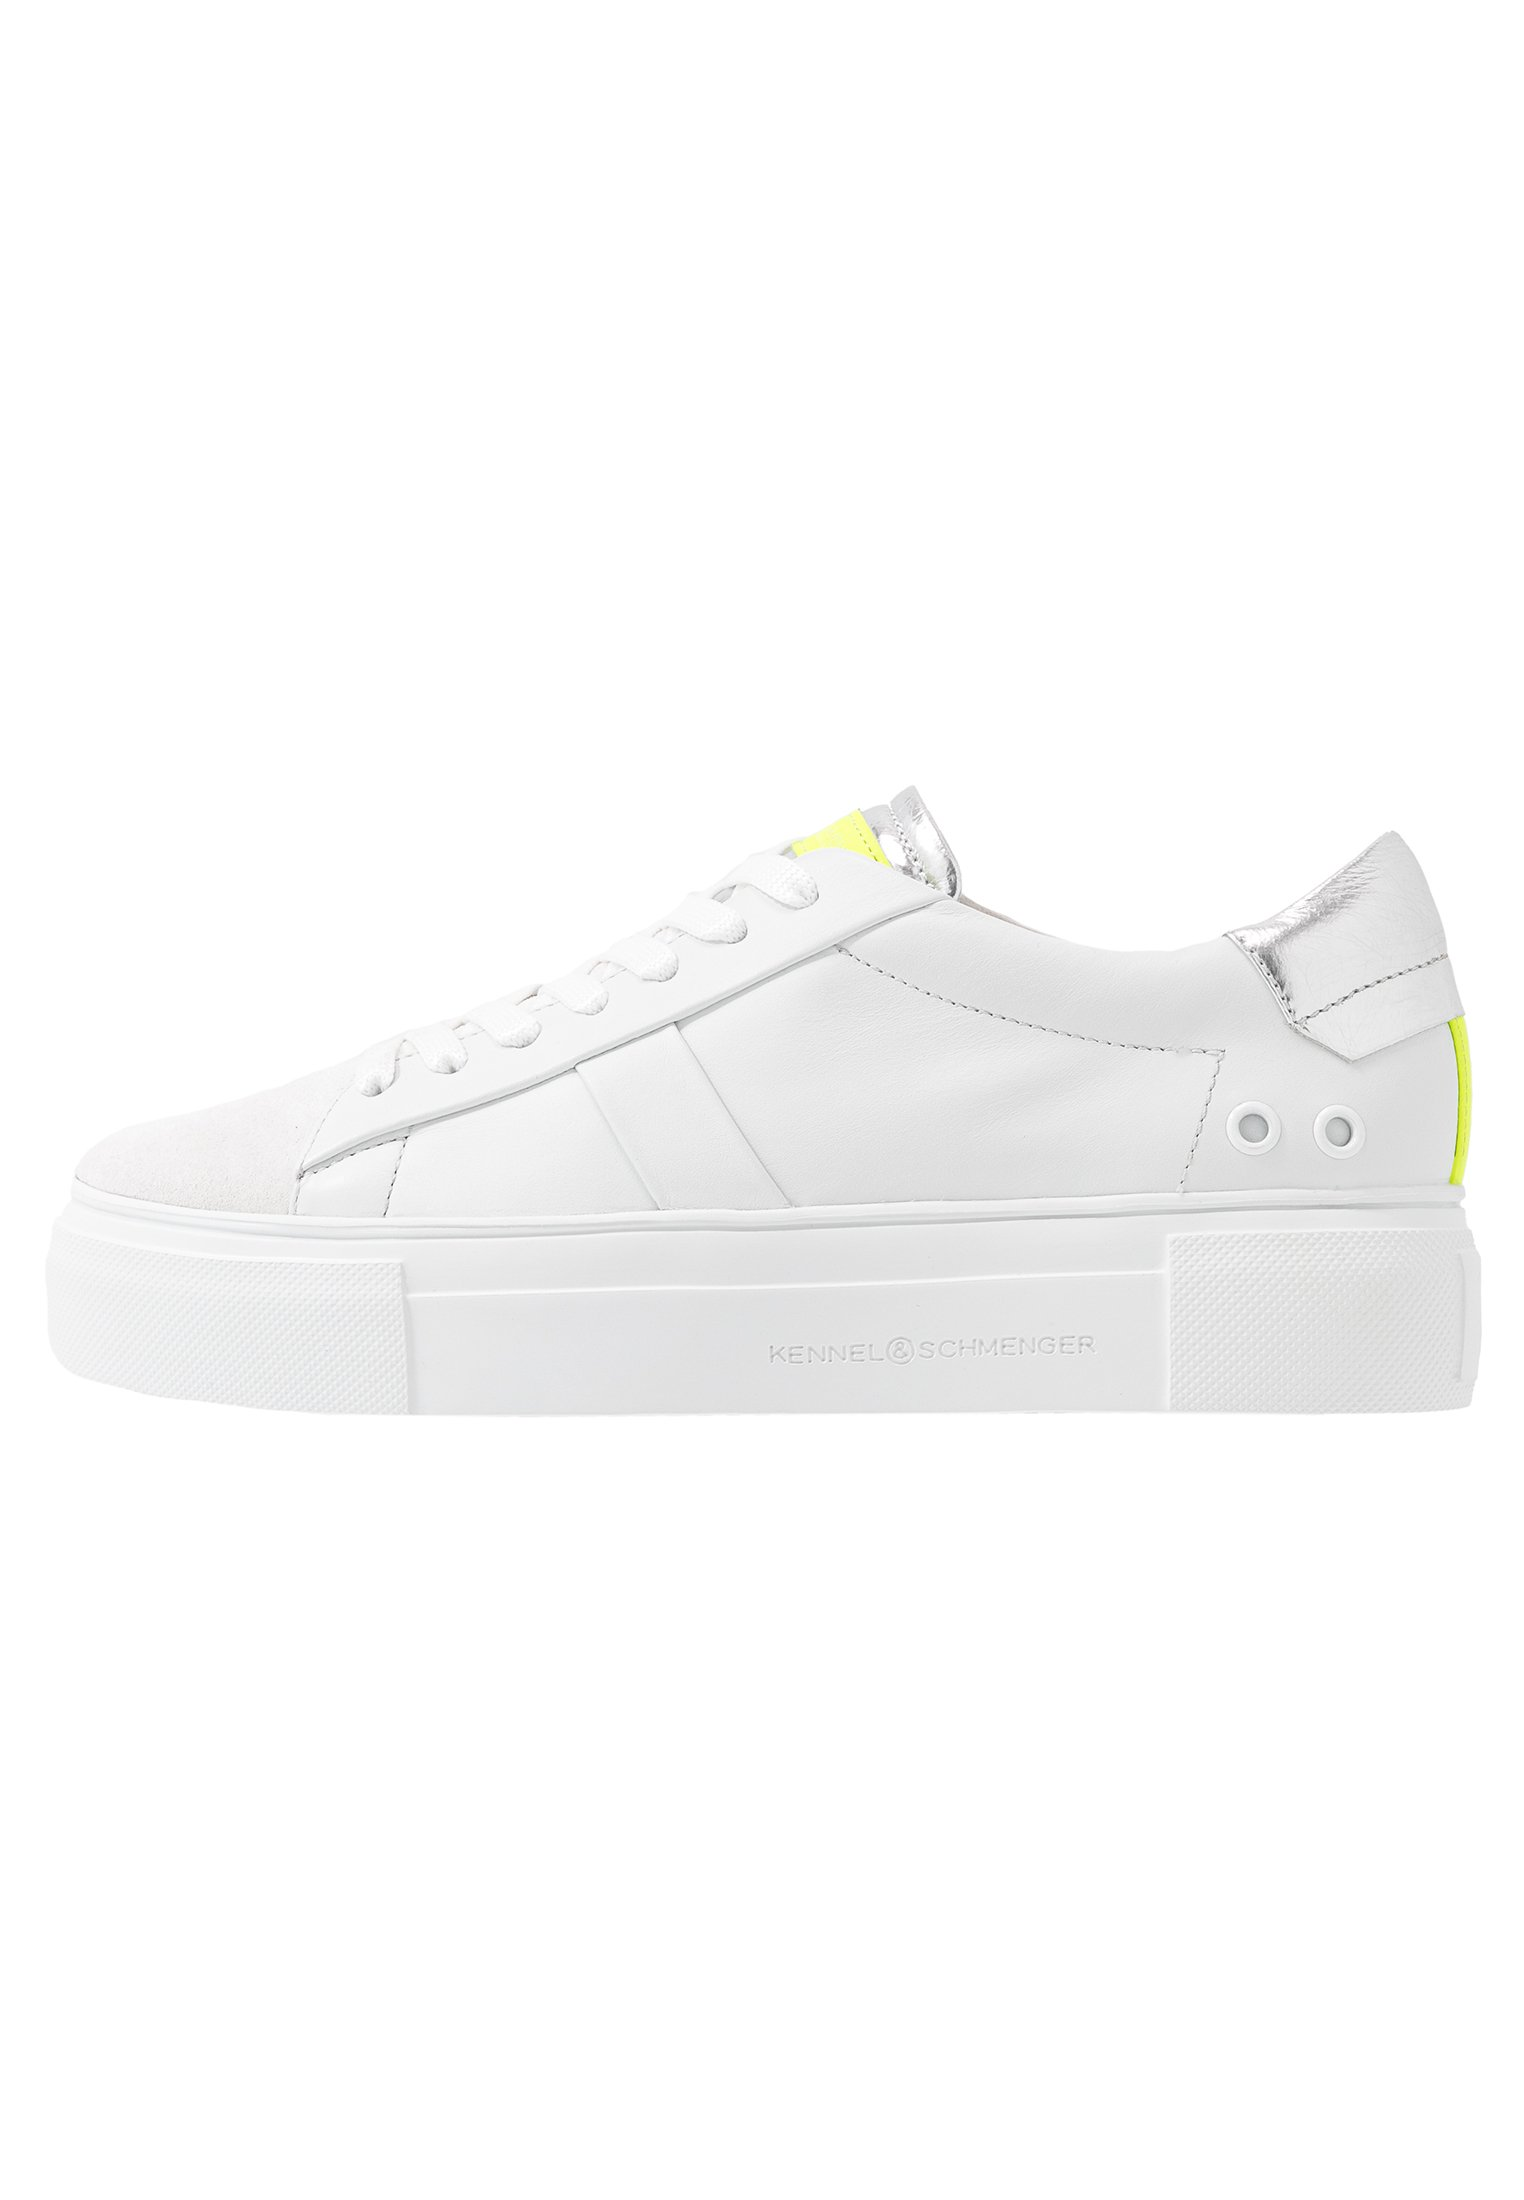 BIG Sneakers biancosilverneon yellow